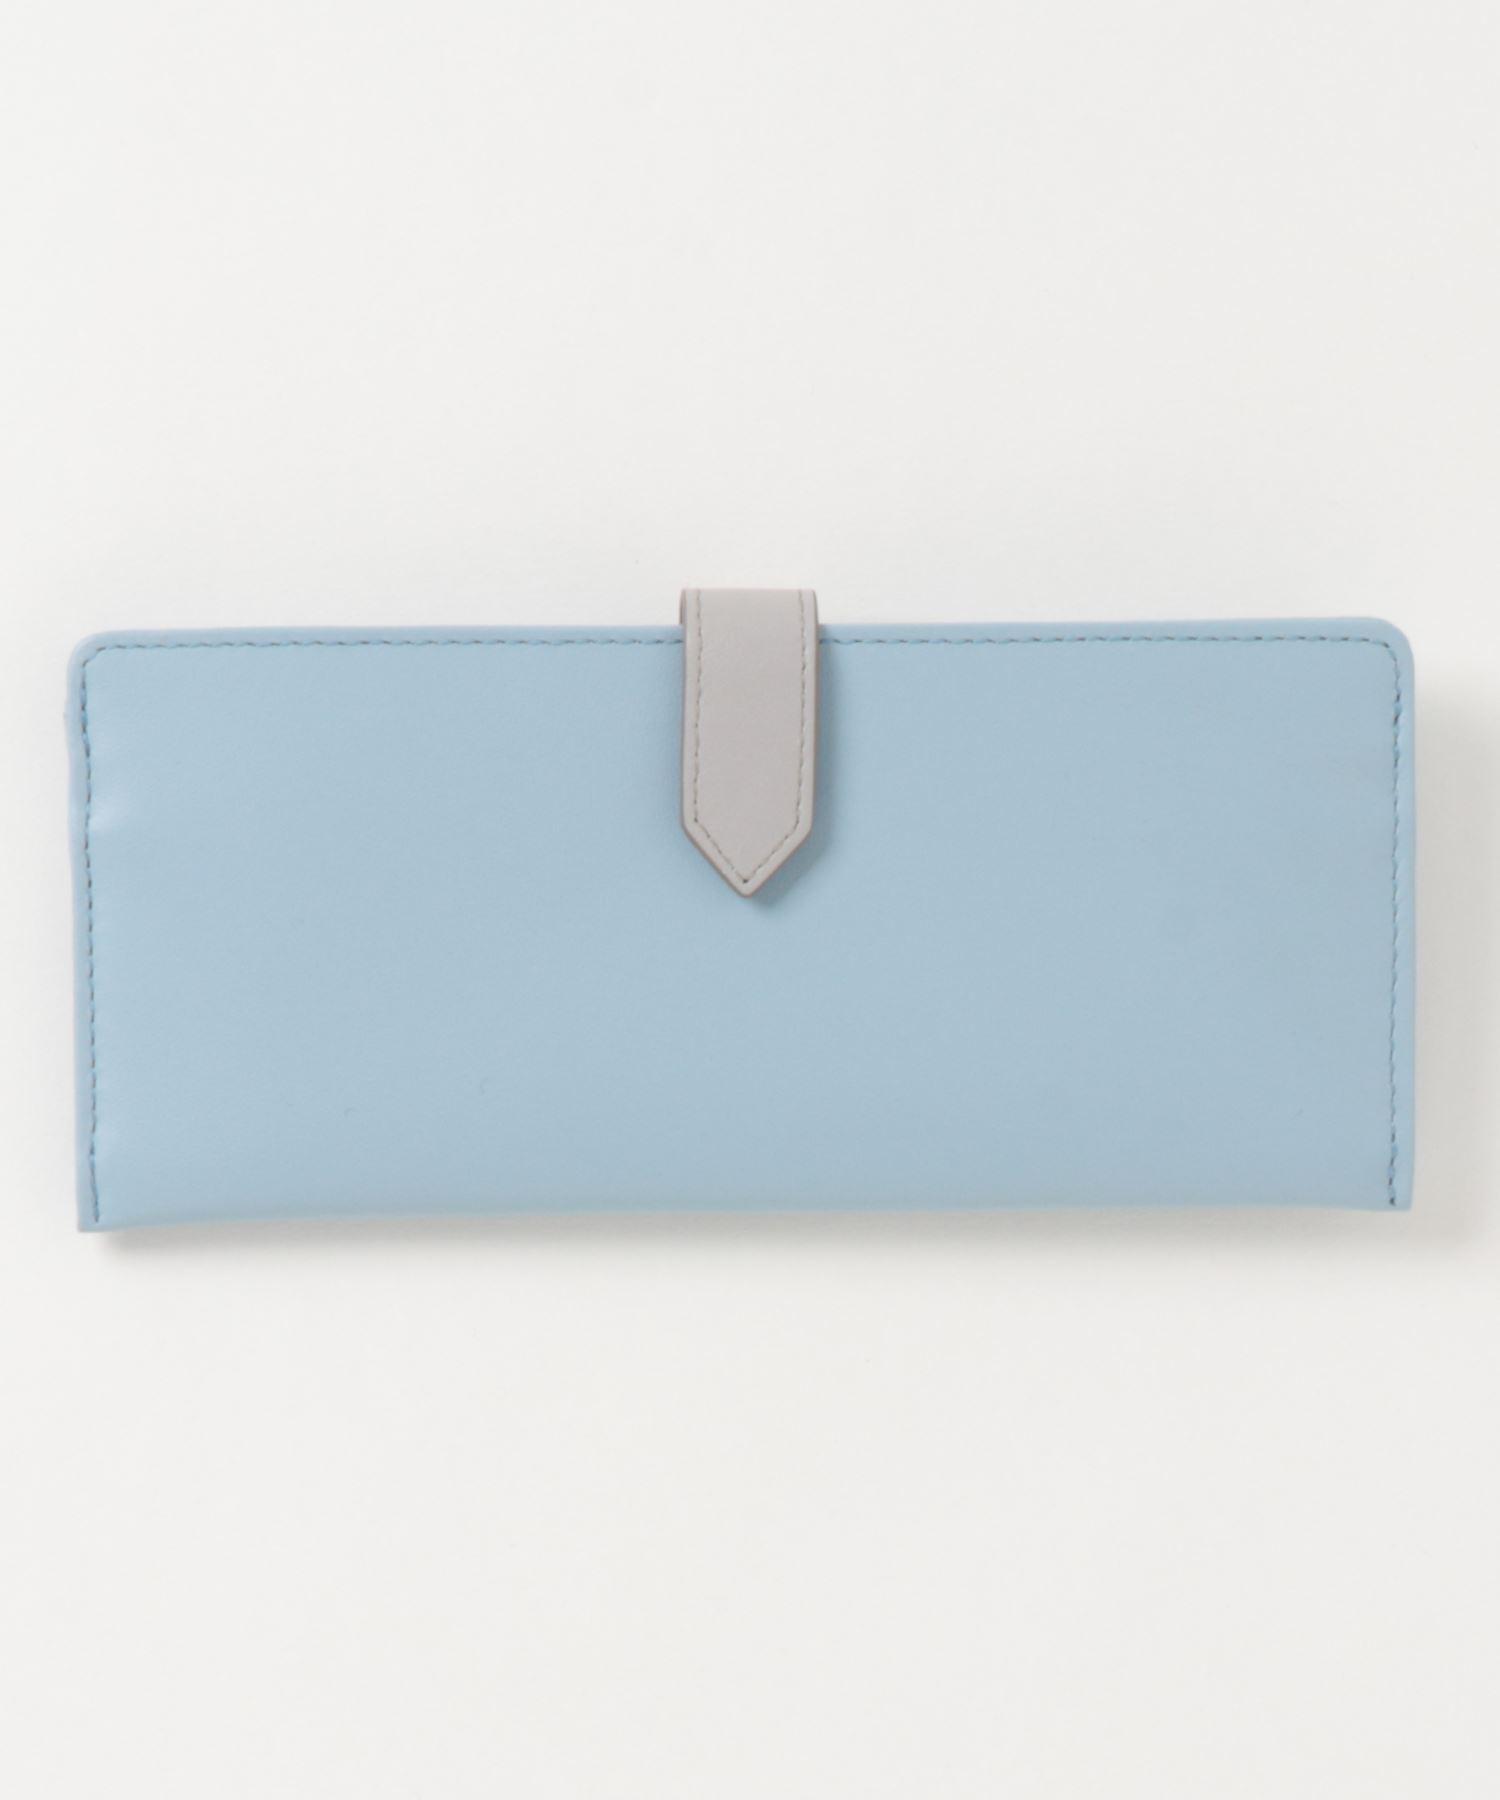 HSG-03/財布